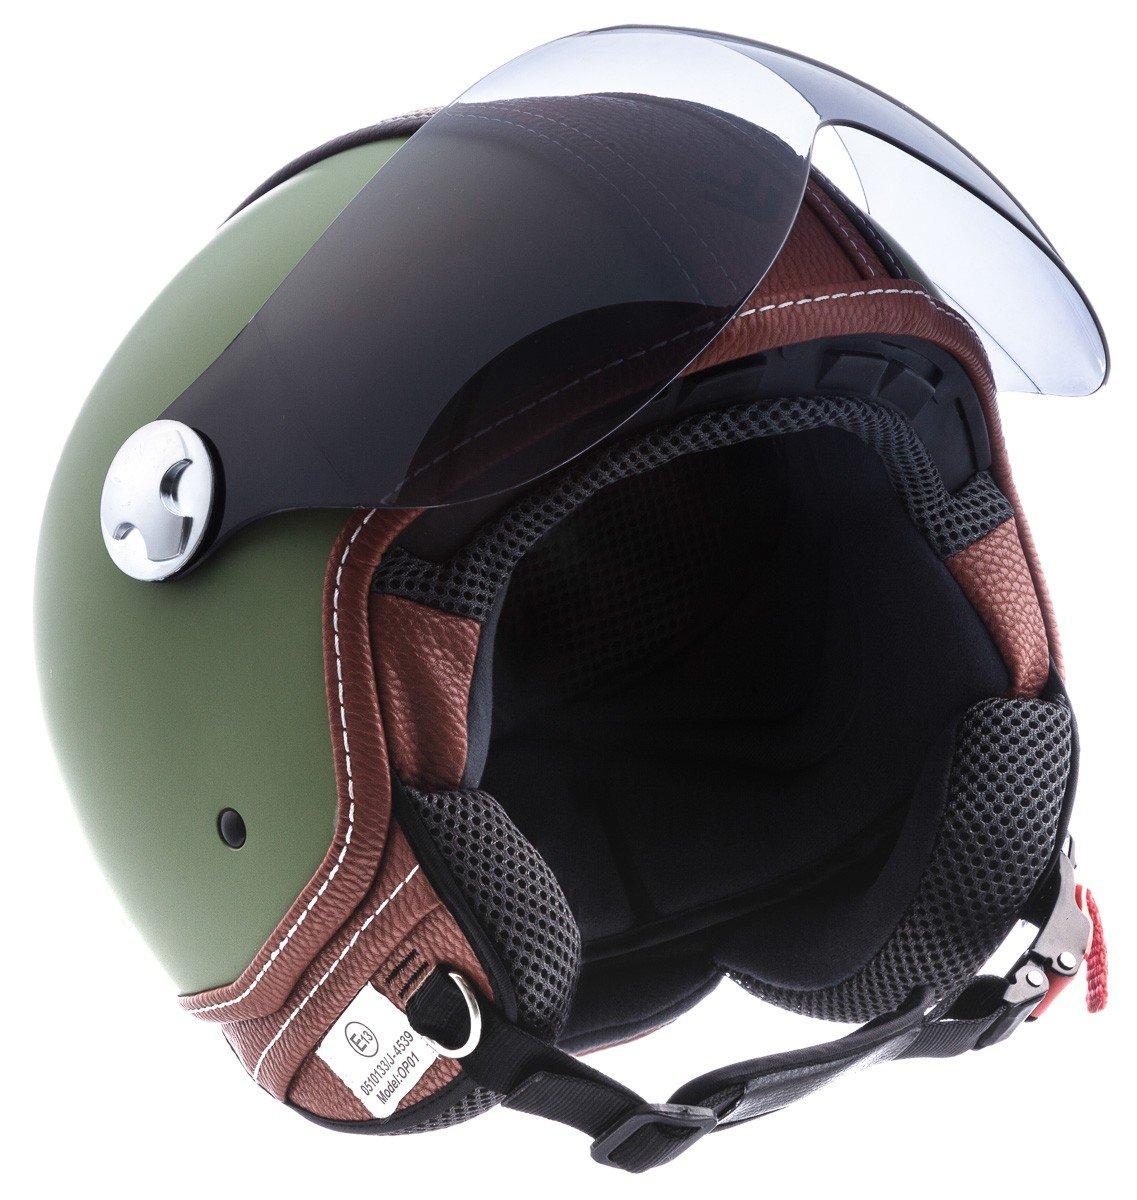 "Armor · AV-84 ""Vintage Deluxe"" · Open Face Helmet · Pilot Motorbike Scooter Motorcycle Retro Jet · ECE certified · Visor · Click-n-Secure™ Clip · Carrier Bag · S (55-56cm)"